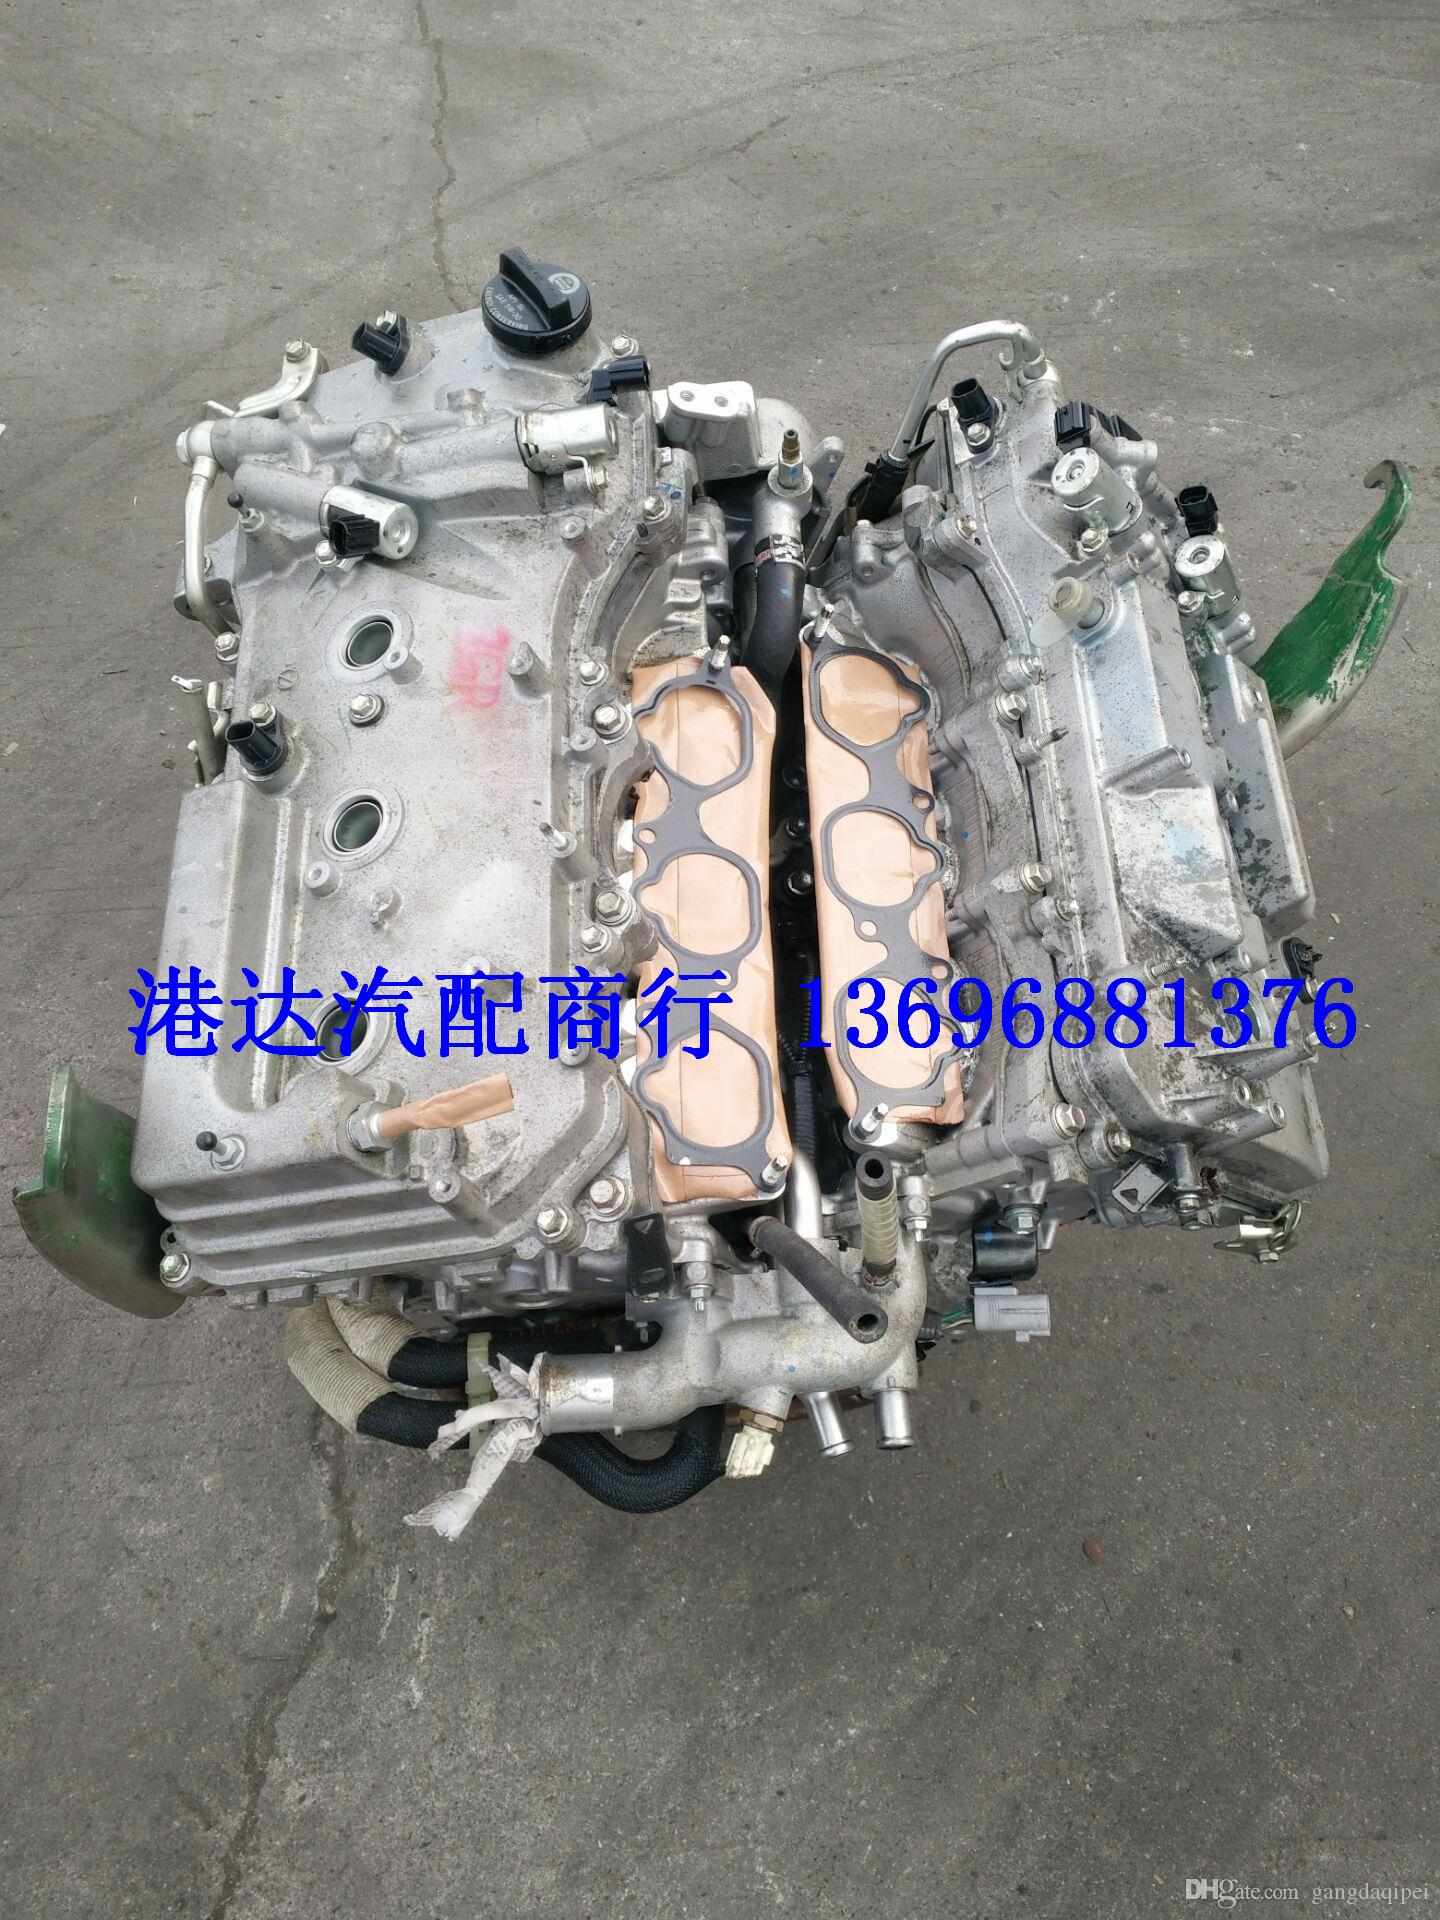 2018 Engines For Tianjin Crown Lexus 2 5 3 0 3 5 5gr 3gr 2gr